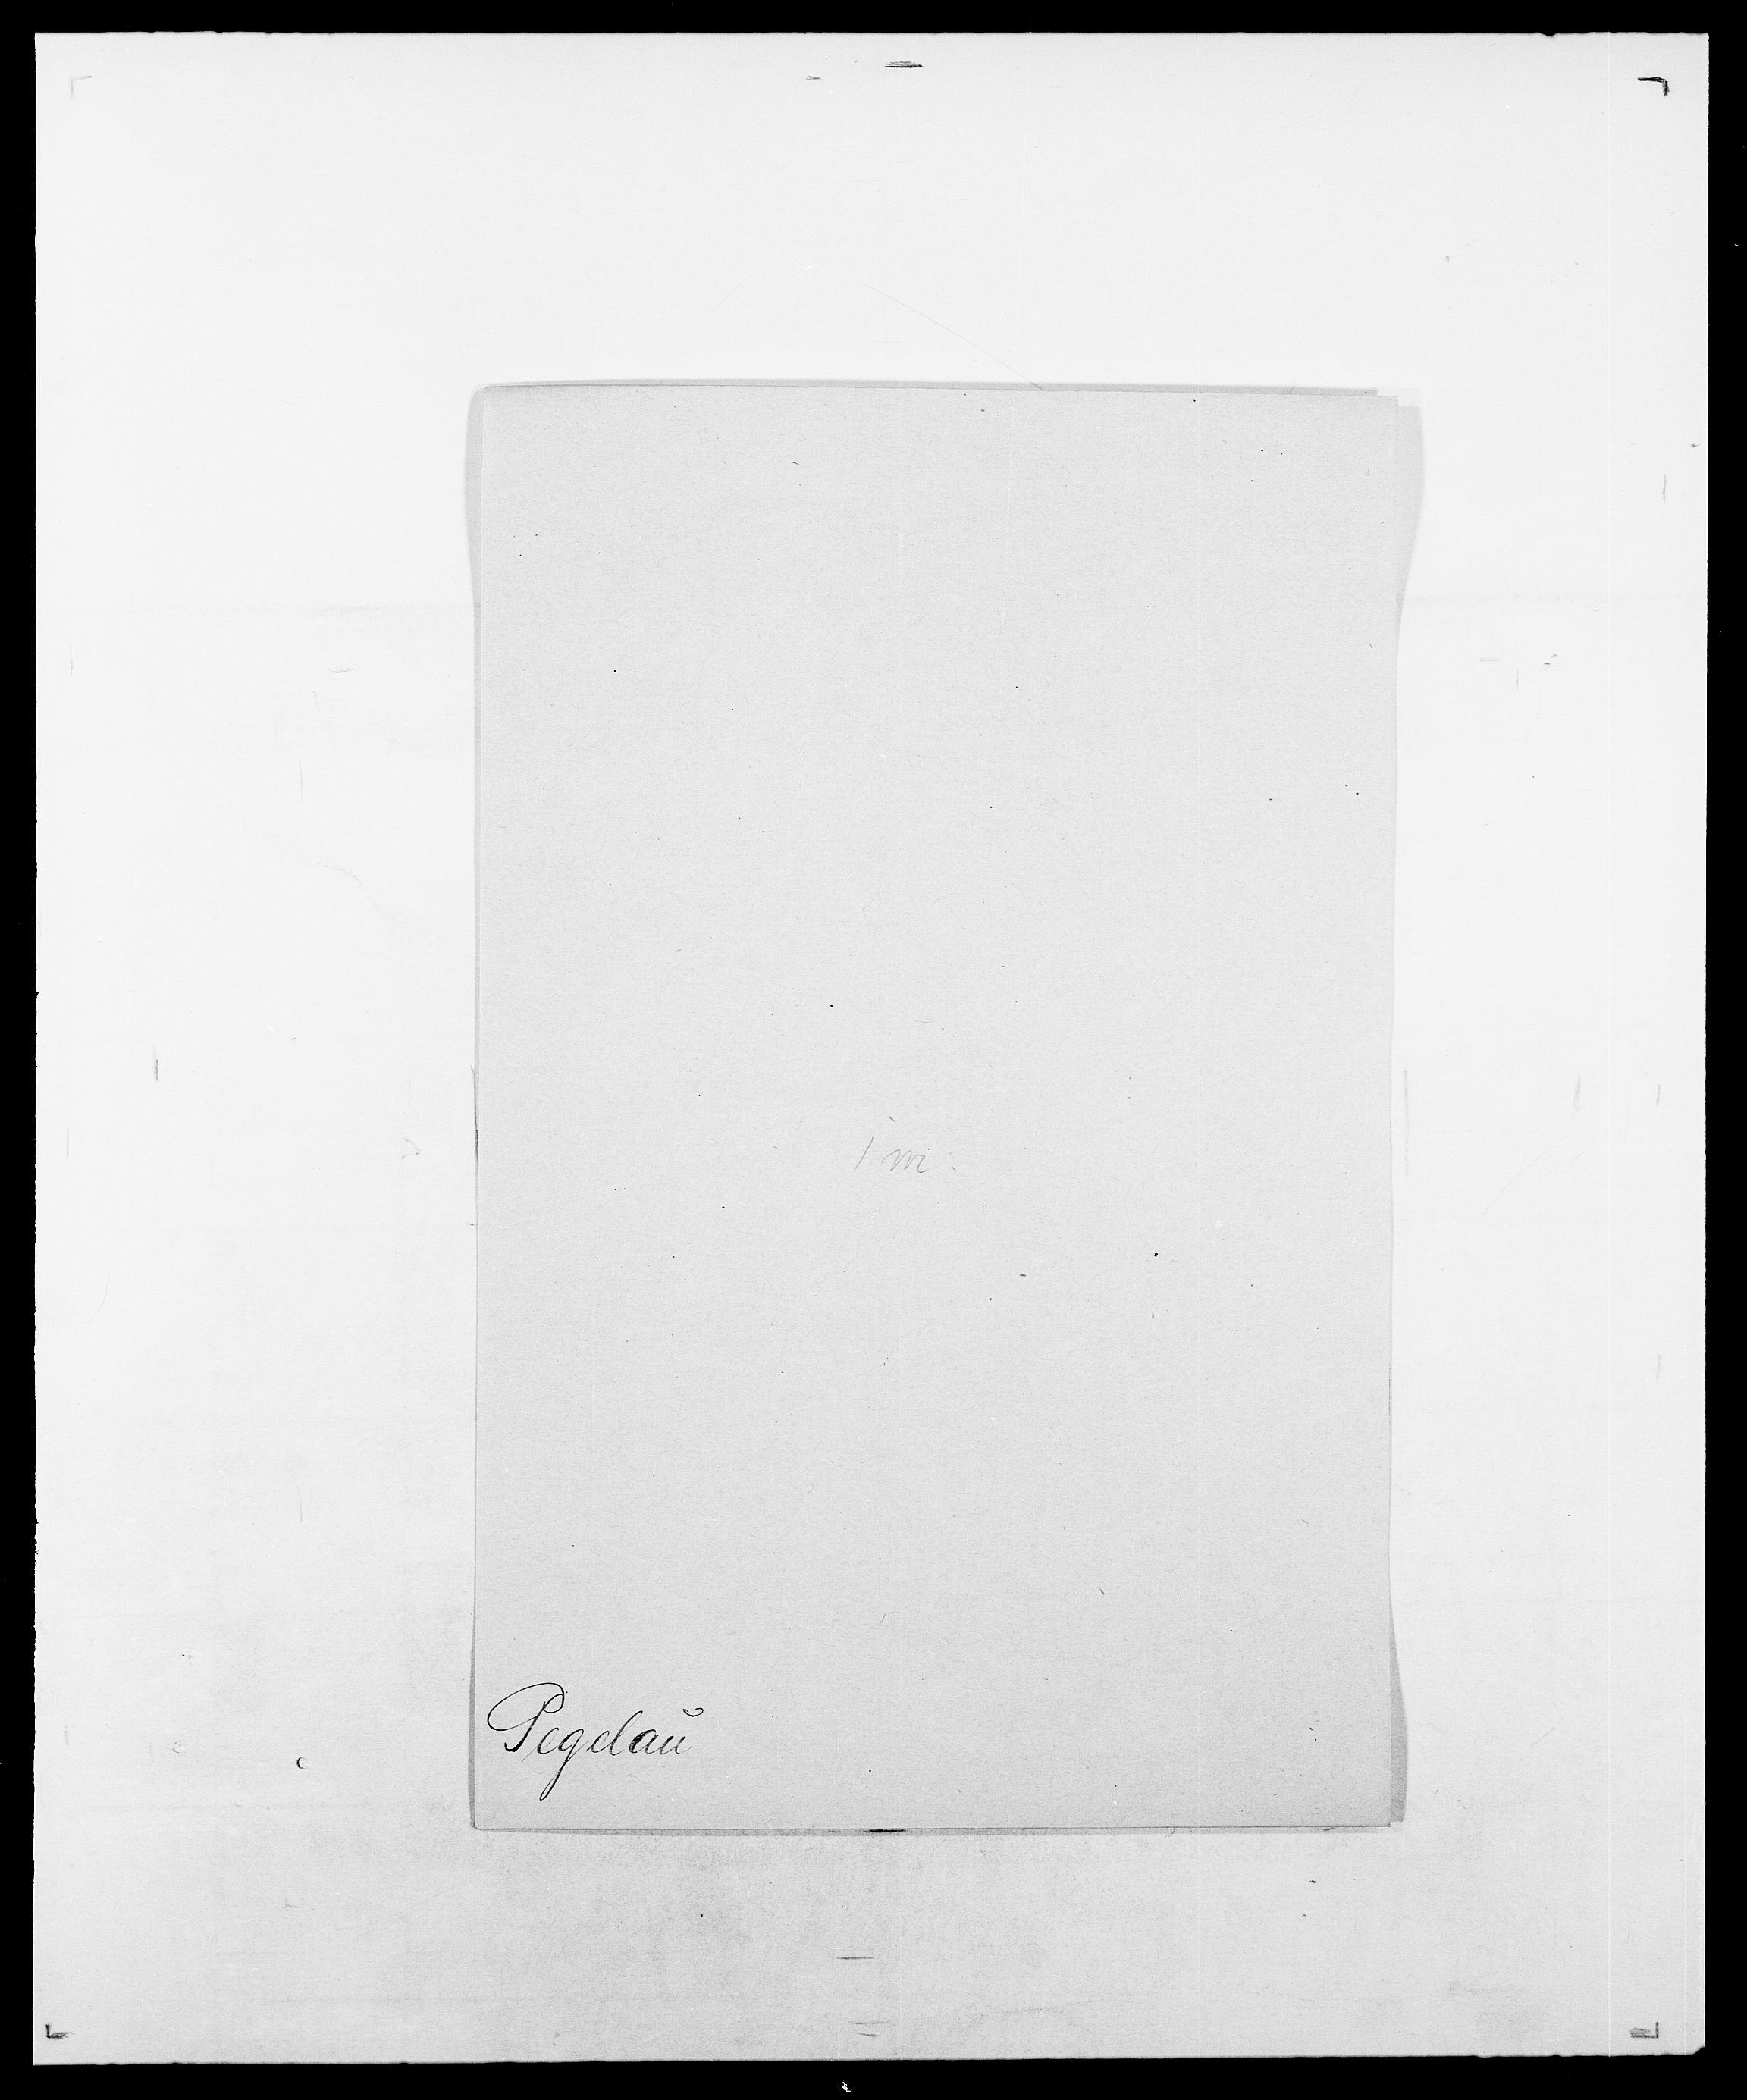 SAO, Delgobe, Charles Antoine - samling, D/Da/L0030: Paars - Pittelkov, s. 312